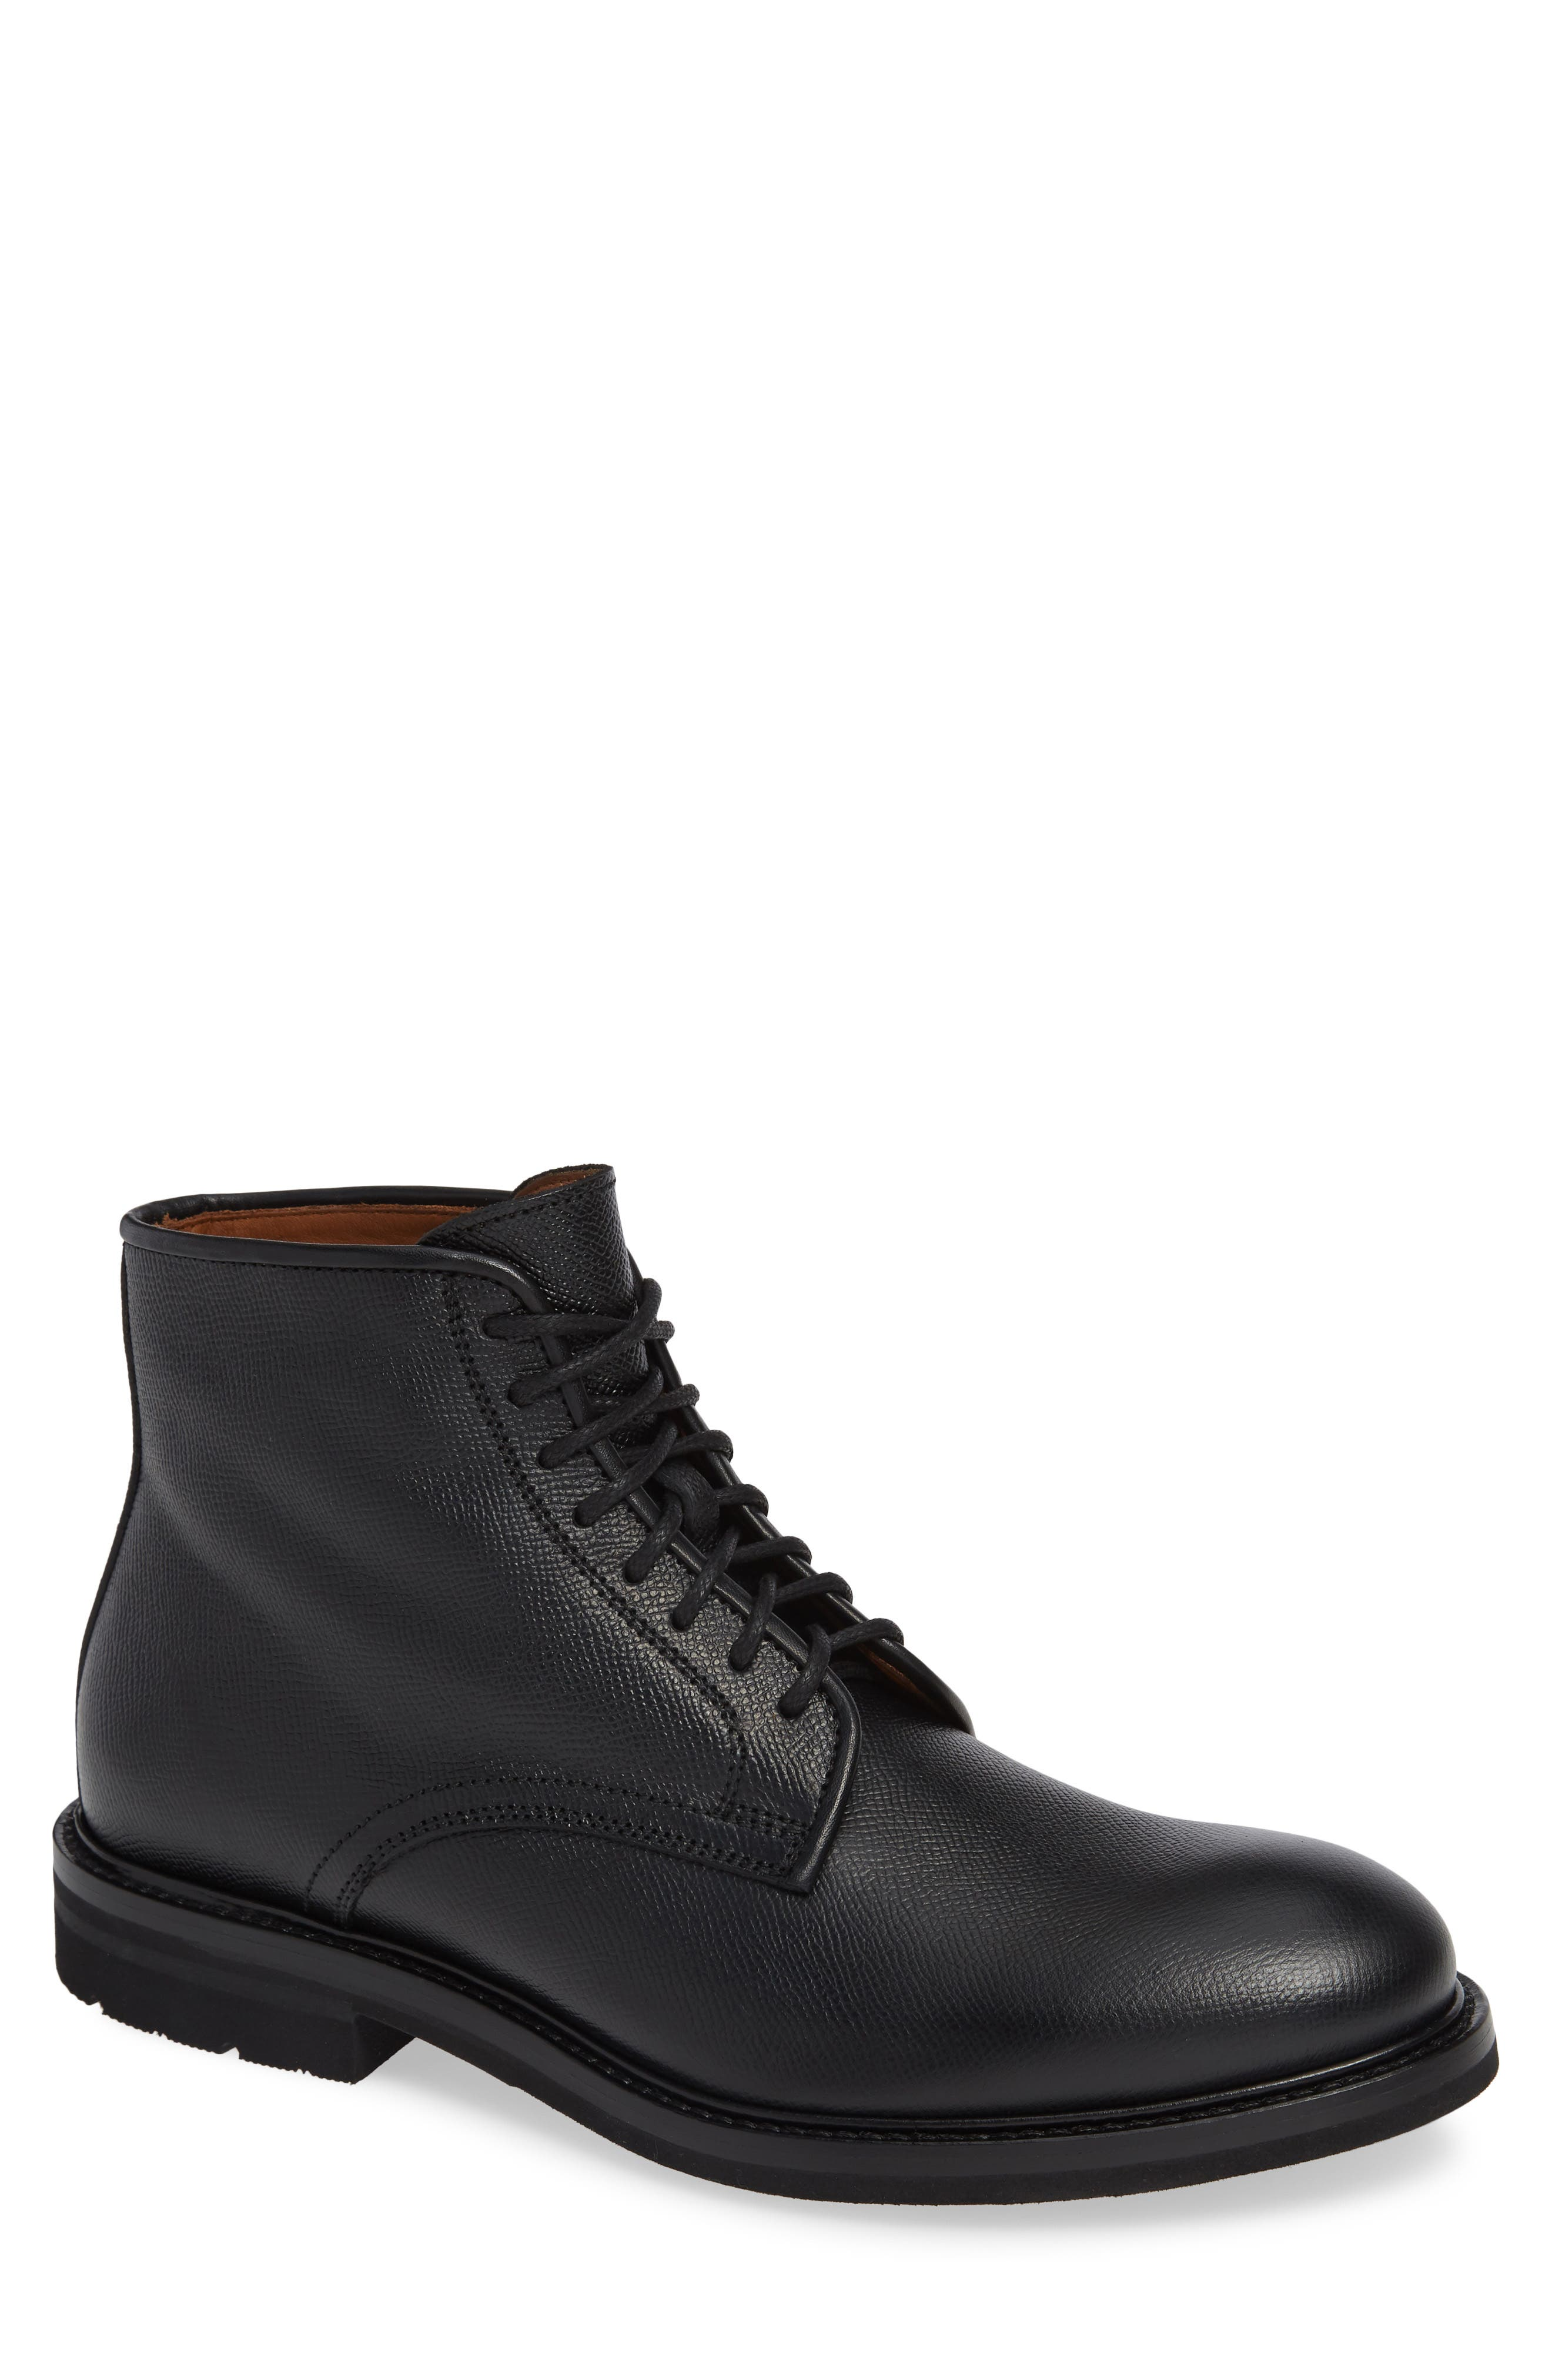 Aquatalia Renzo Water Resistant Plain Toe Waterproof Boot, Black